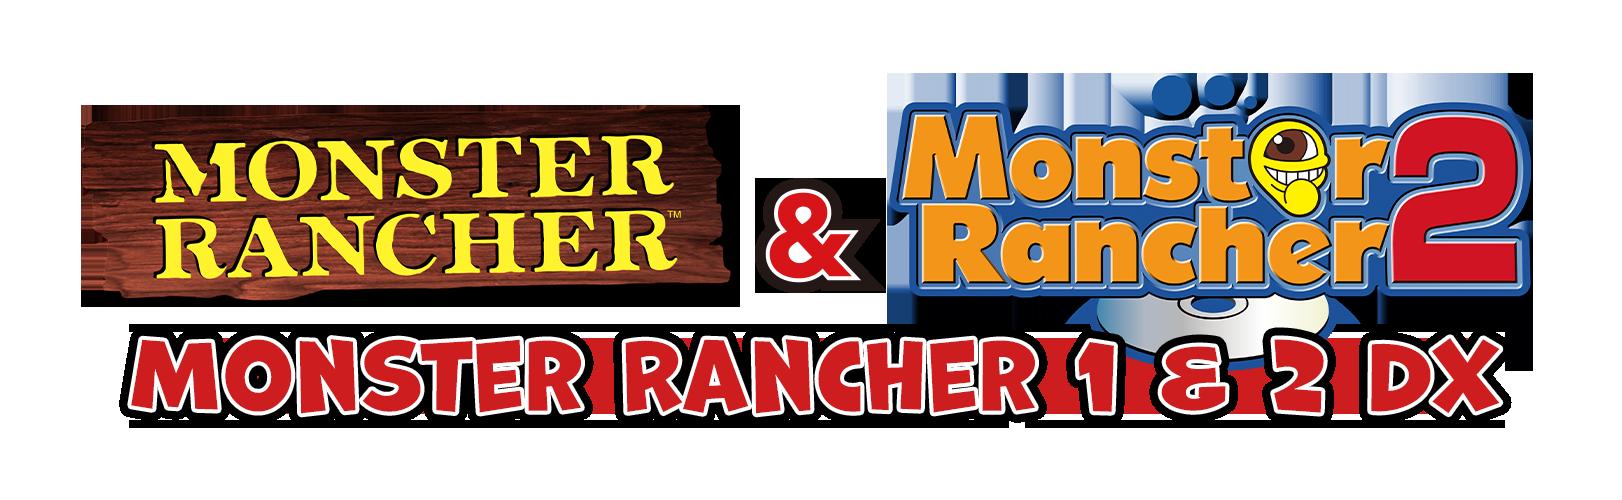 Monster Rancher 1 & 2 DX angekündigt